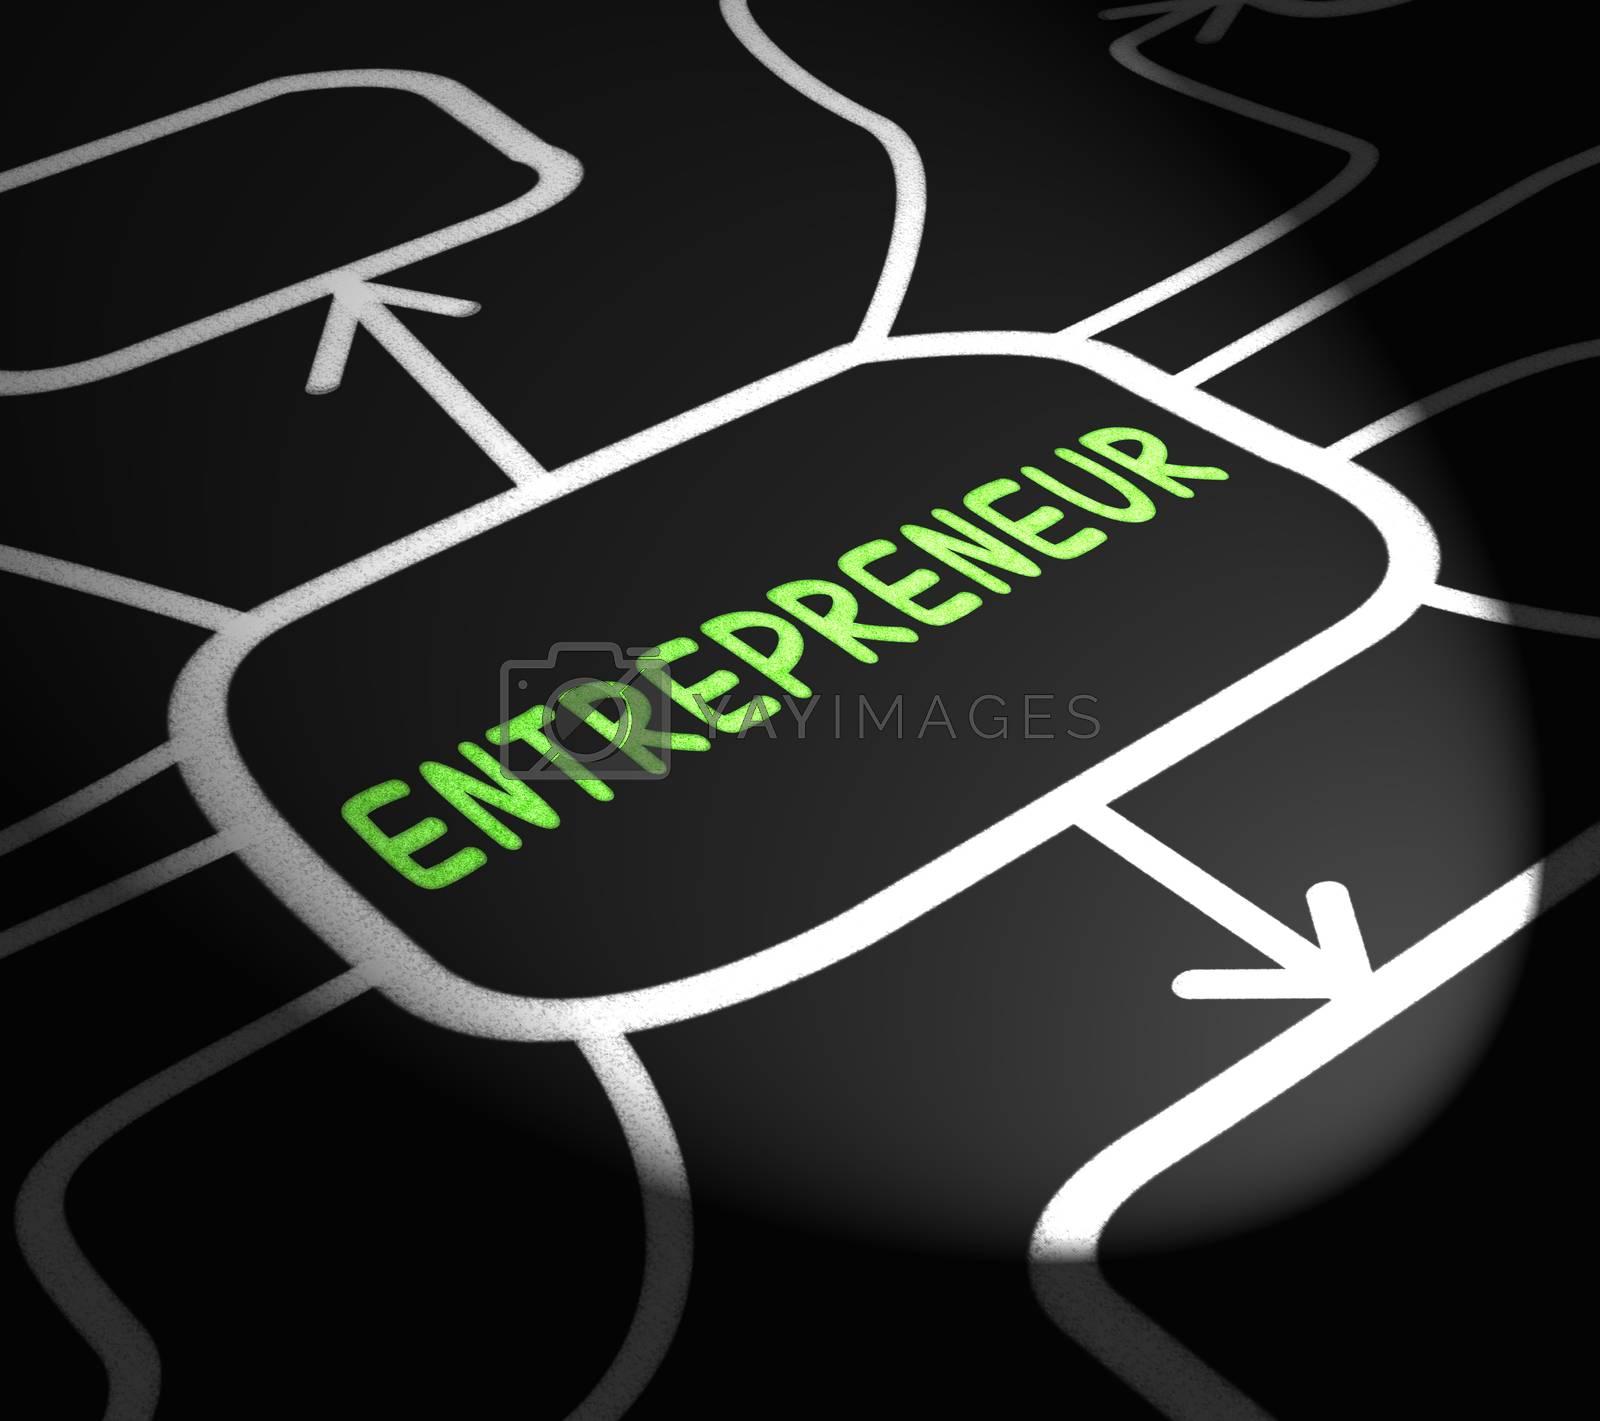 Entrepreneur Arrows Means Starting Business Or Venture by stuartmiles